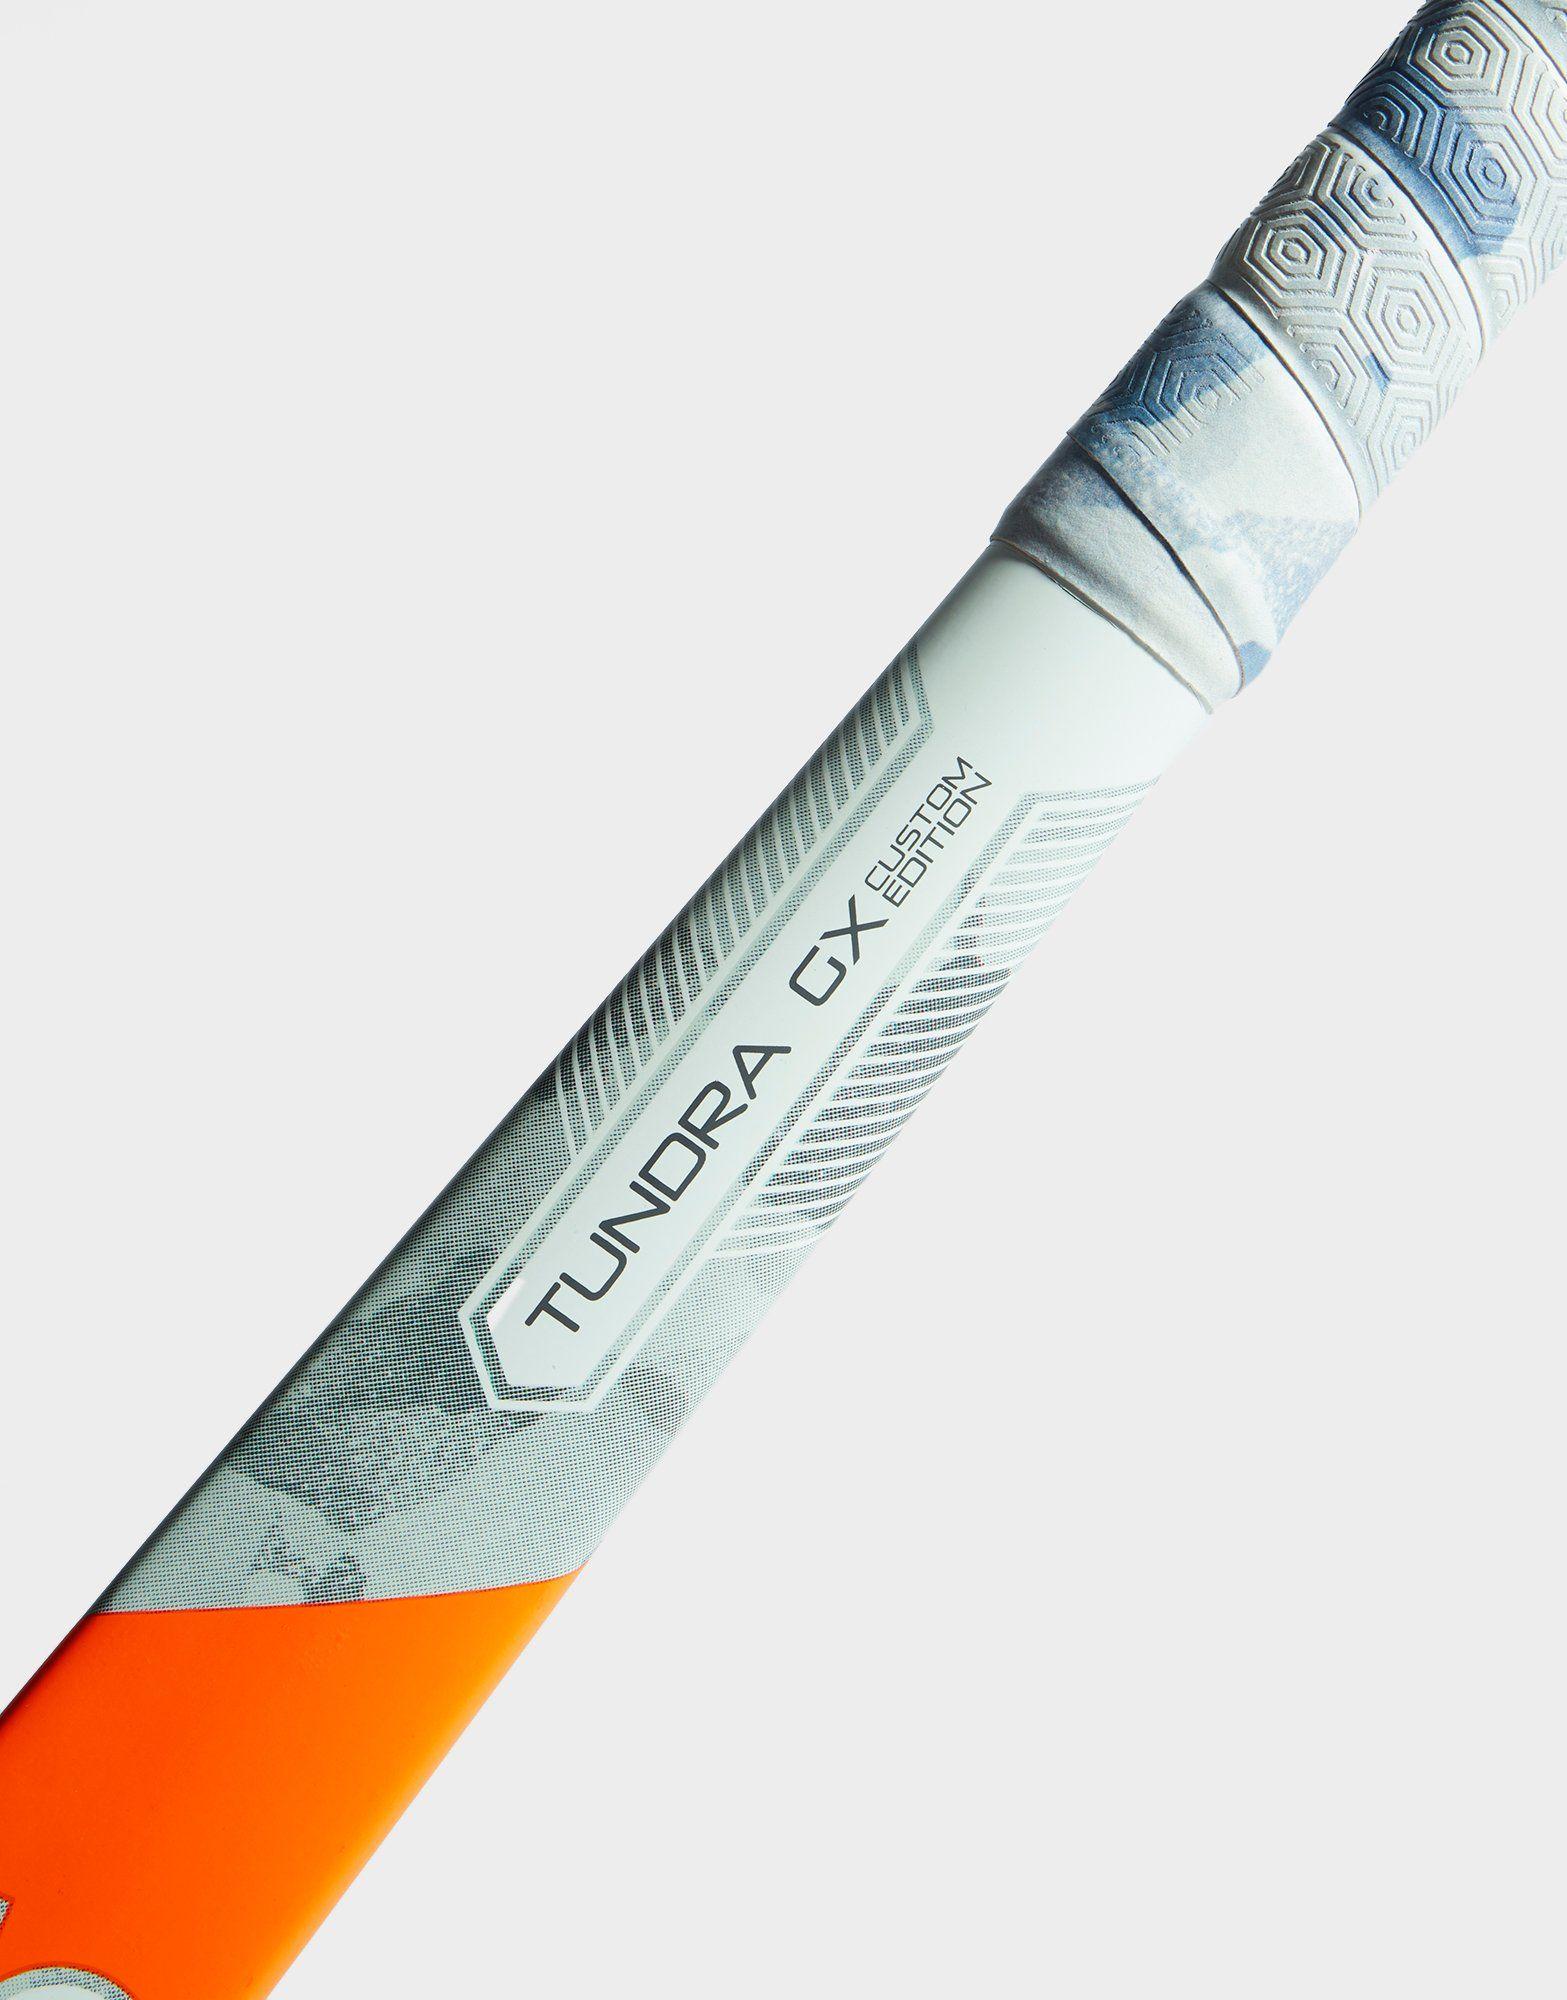 Grays GX CE Tundra Hockey Stick